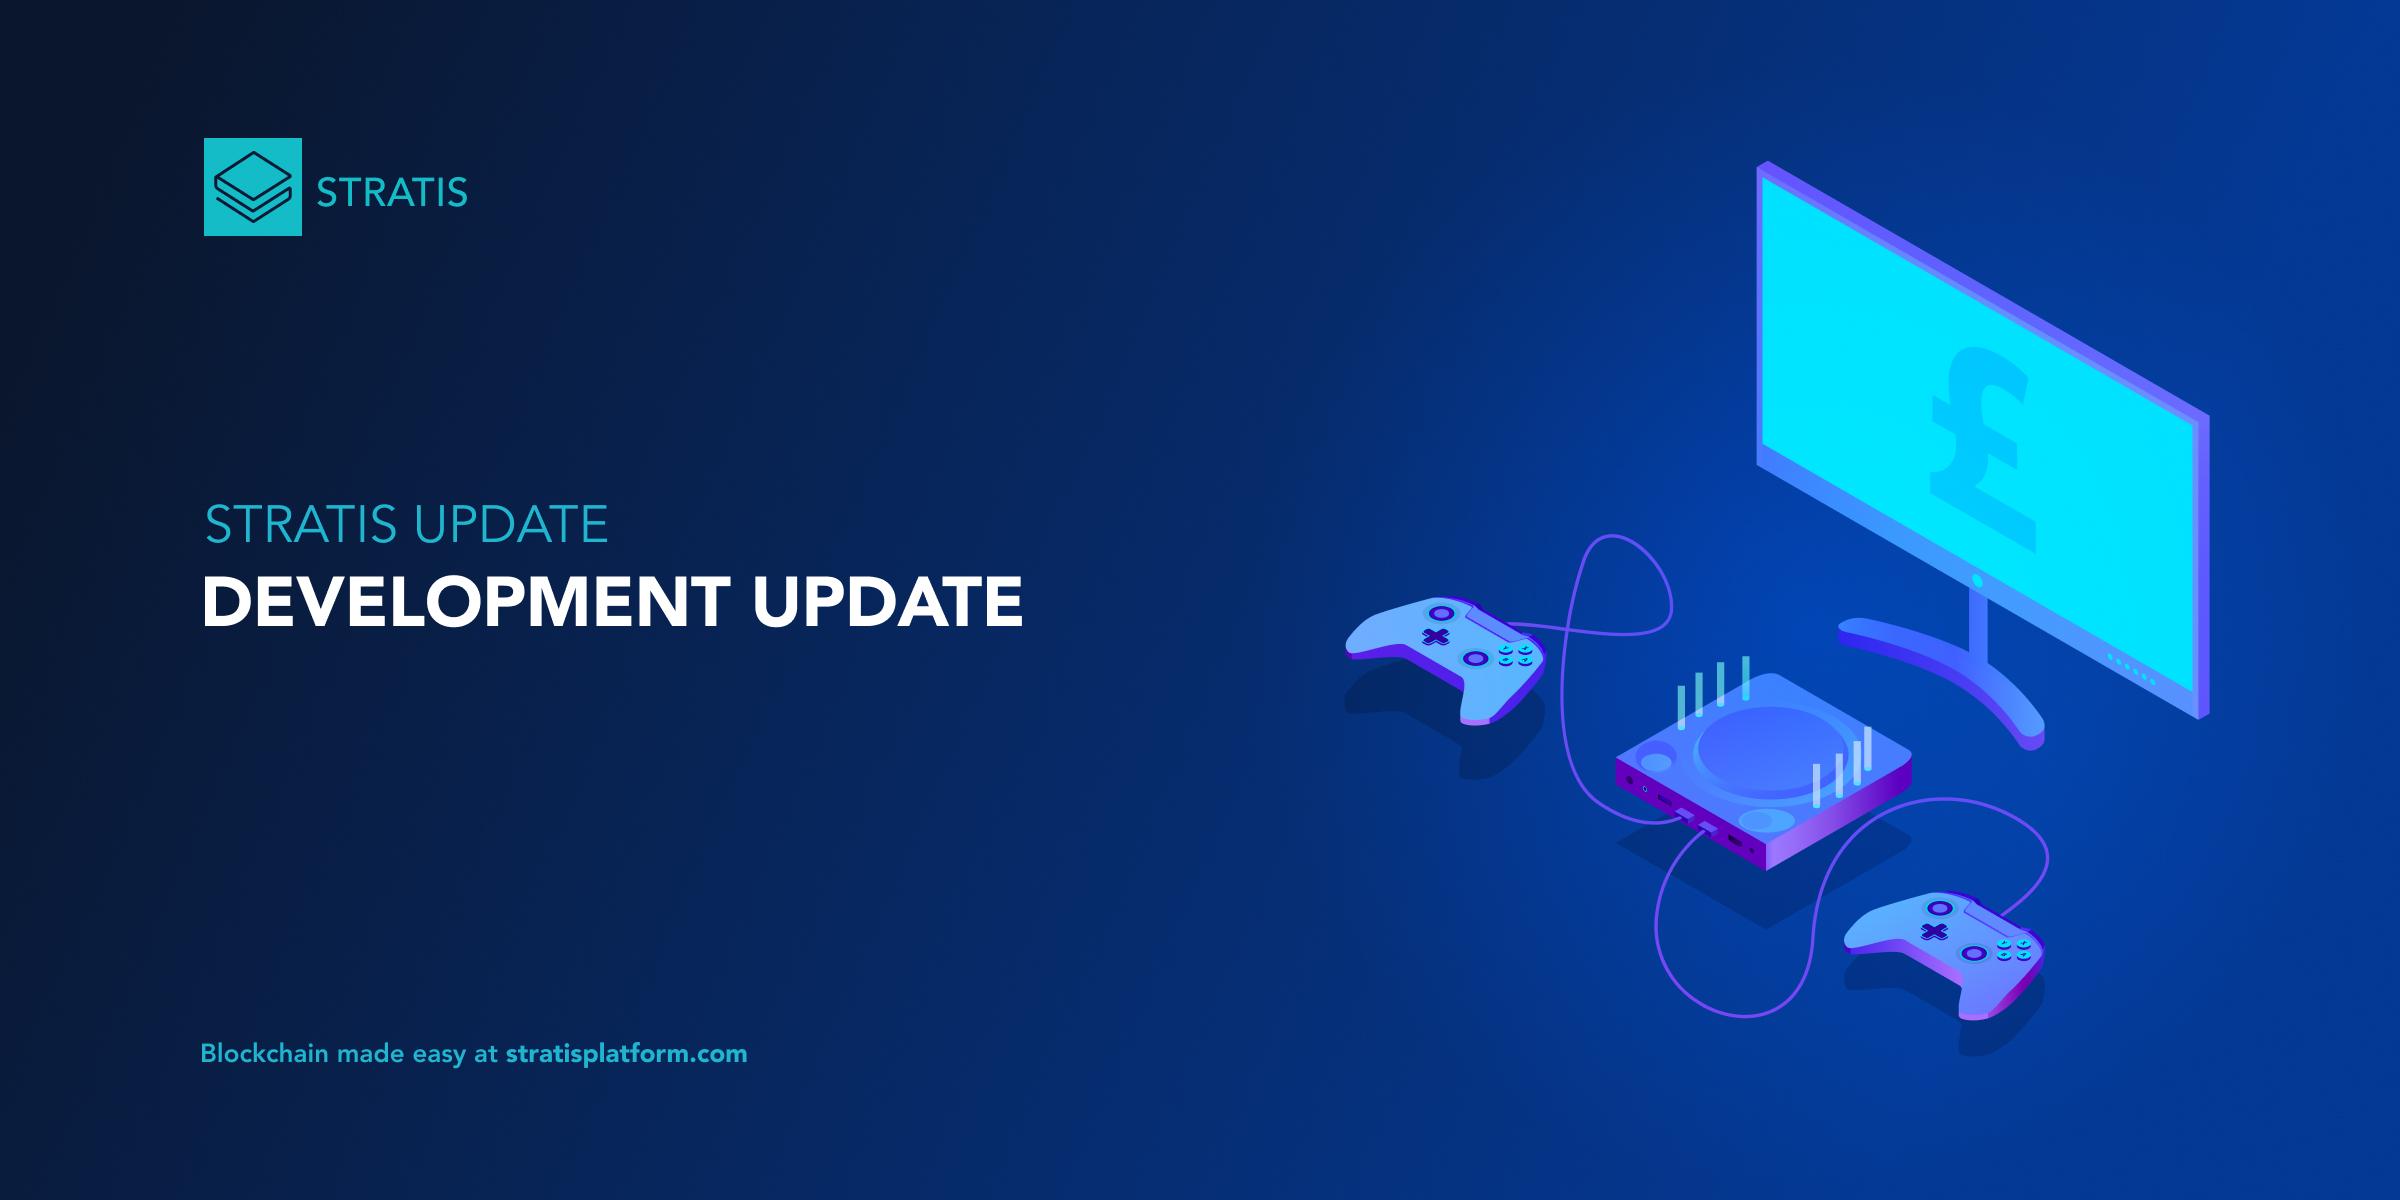 Stratis Development Update